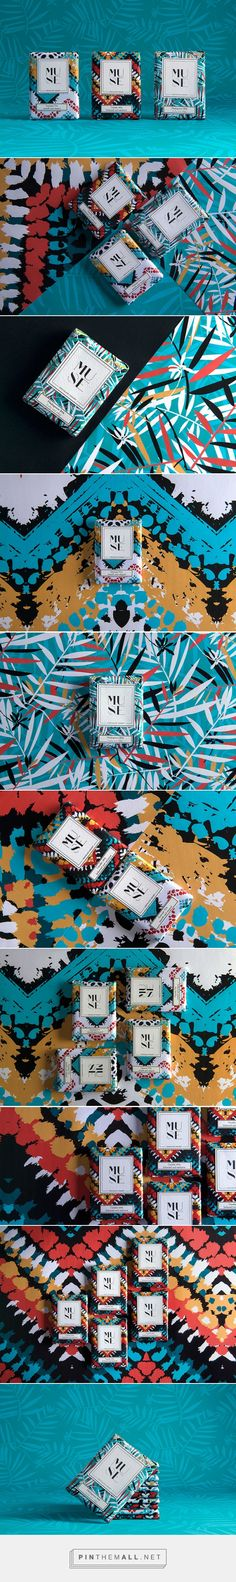 Muse Chocolate Origins by Mo Kalache